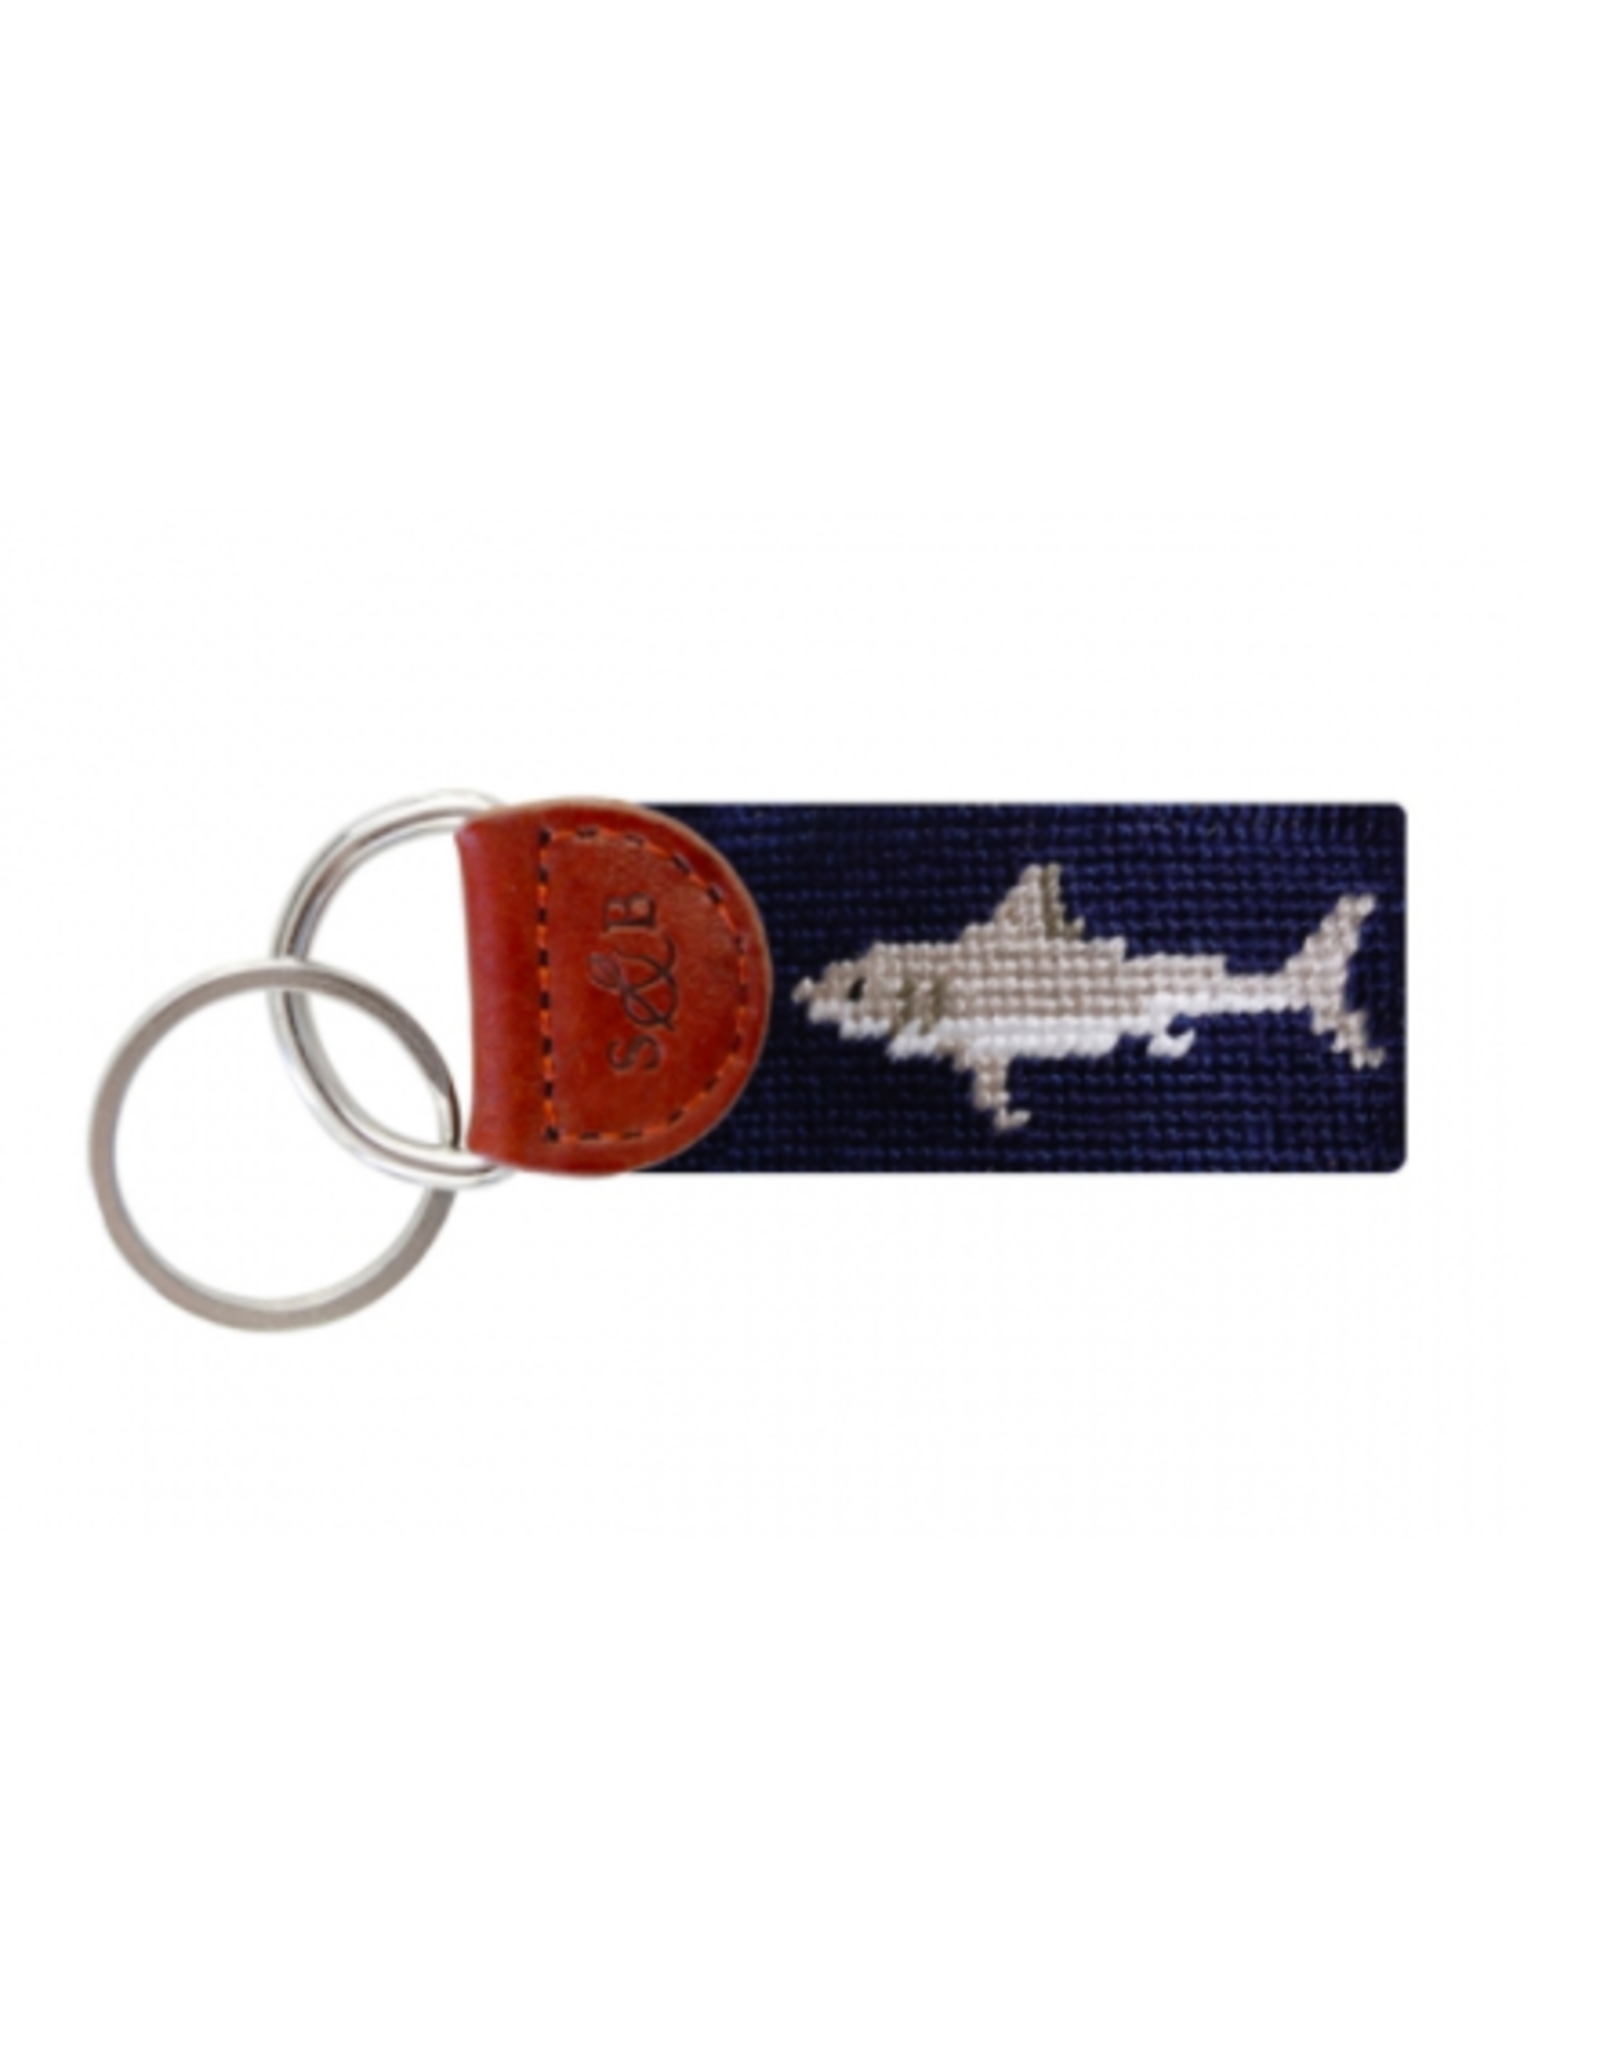 Smathers & Branson Shark Key Fob